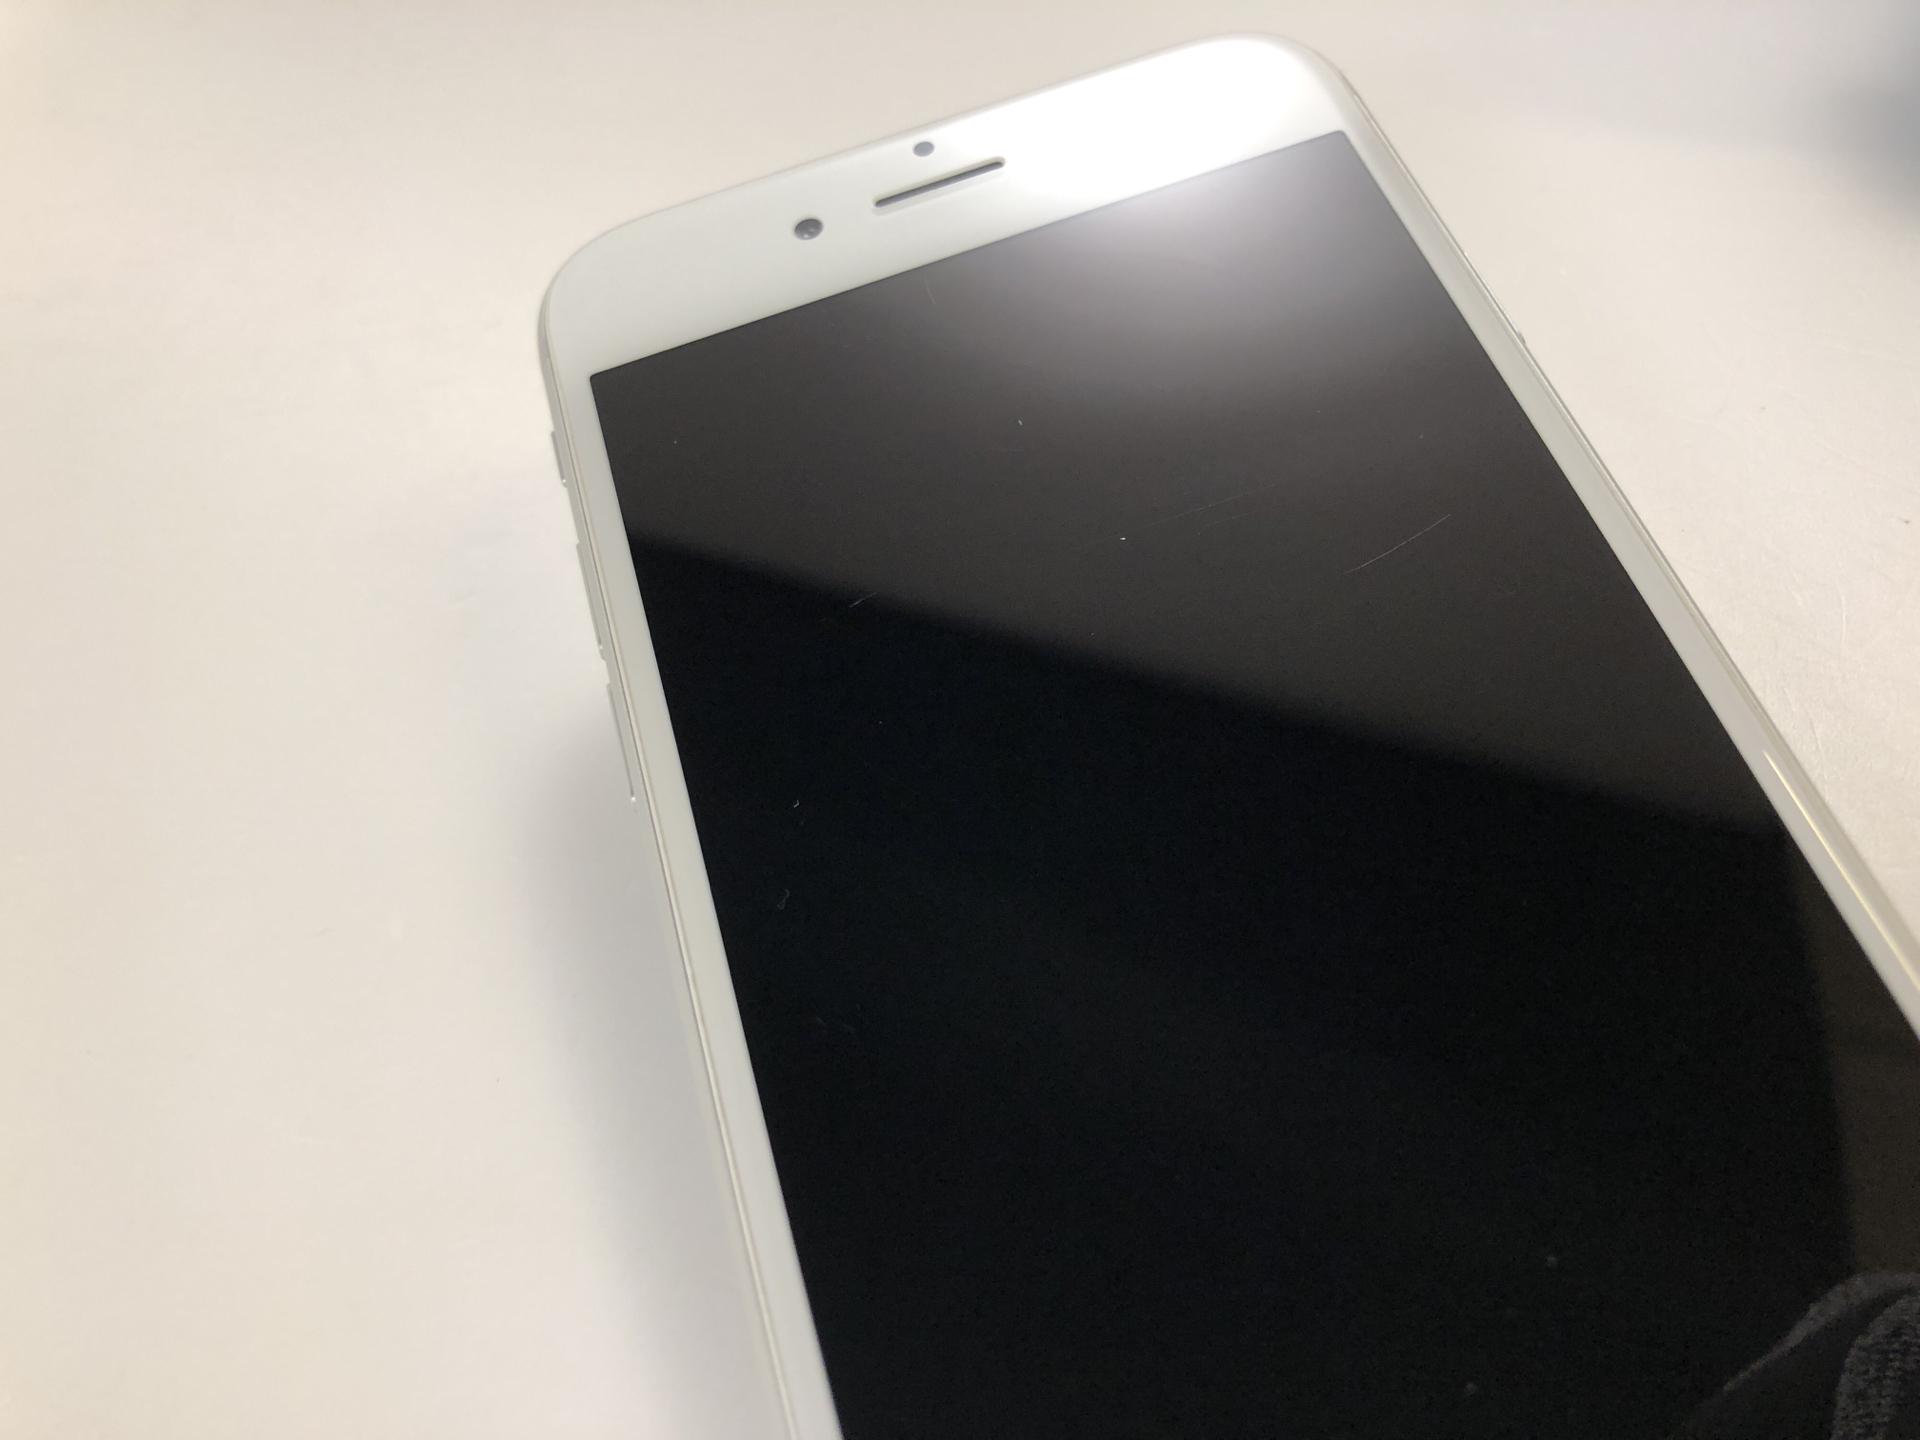 iPhone 6S 16GB, 16GB, Silver, bild 5